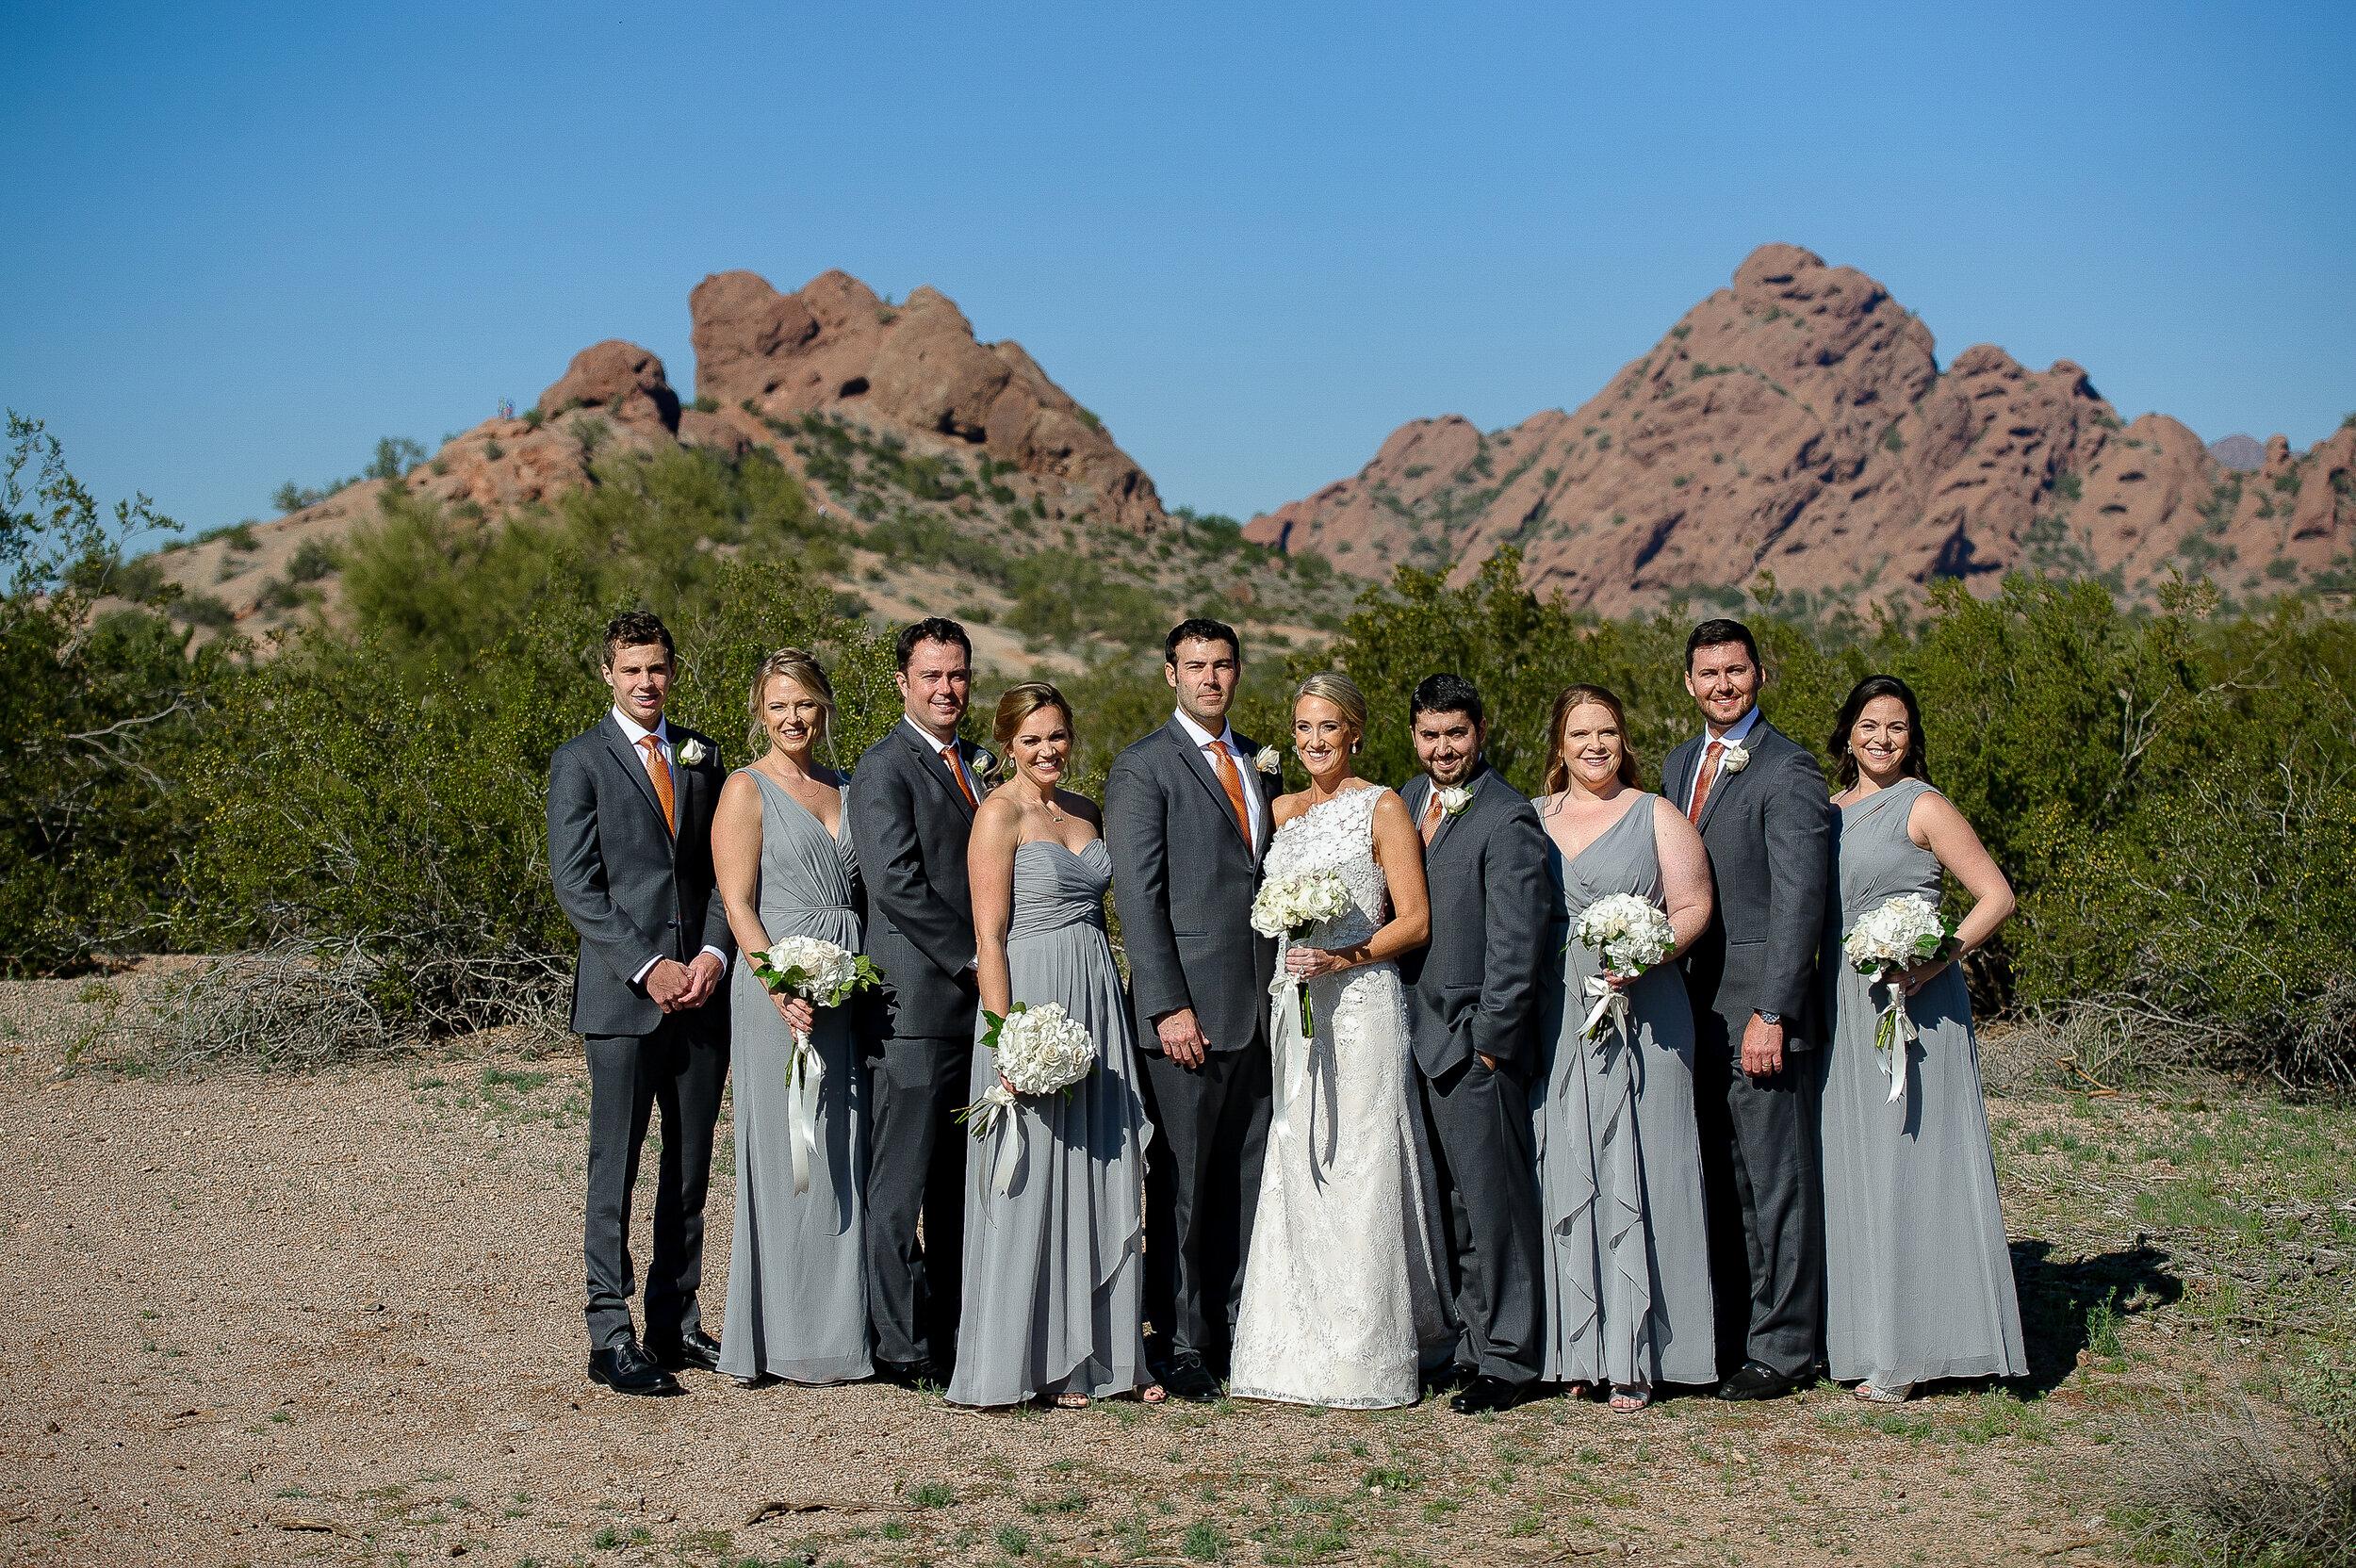 Winter Phoenix resort wedding10.jpg